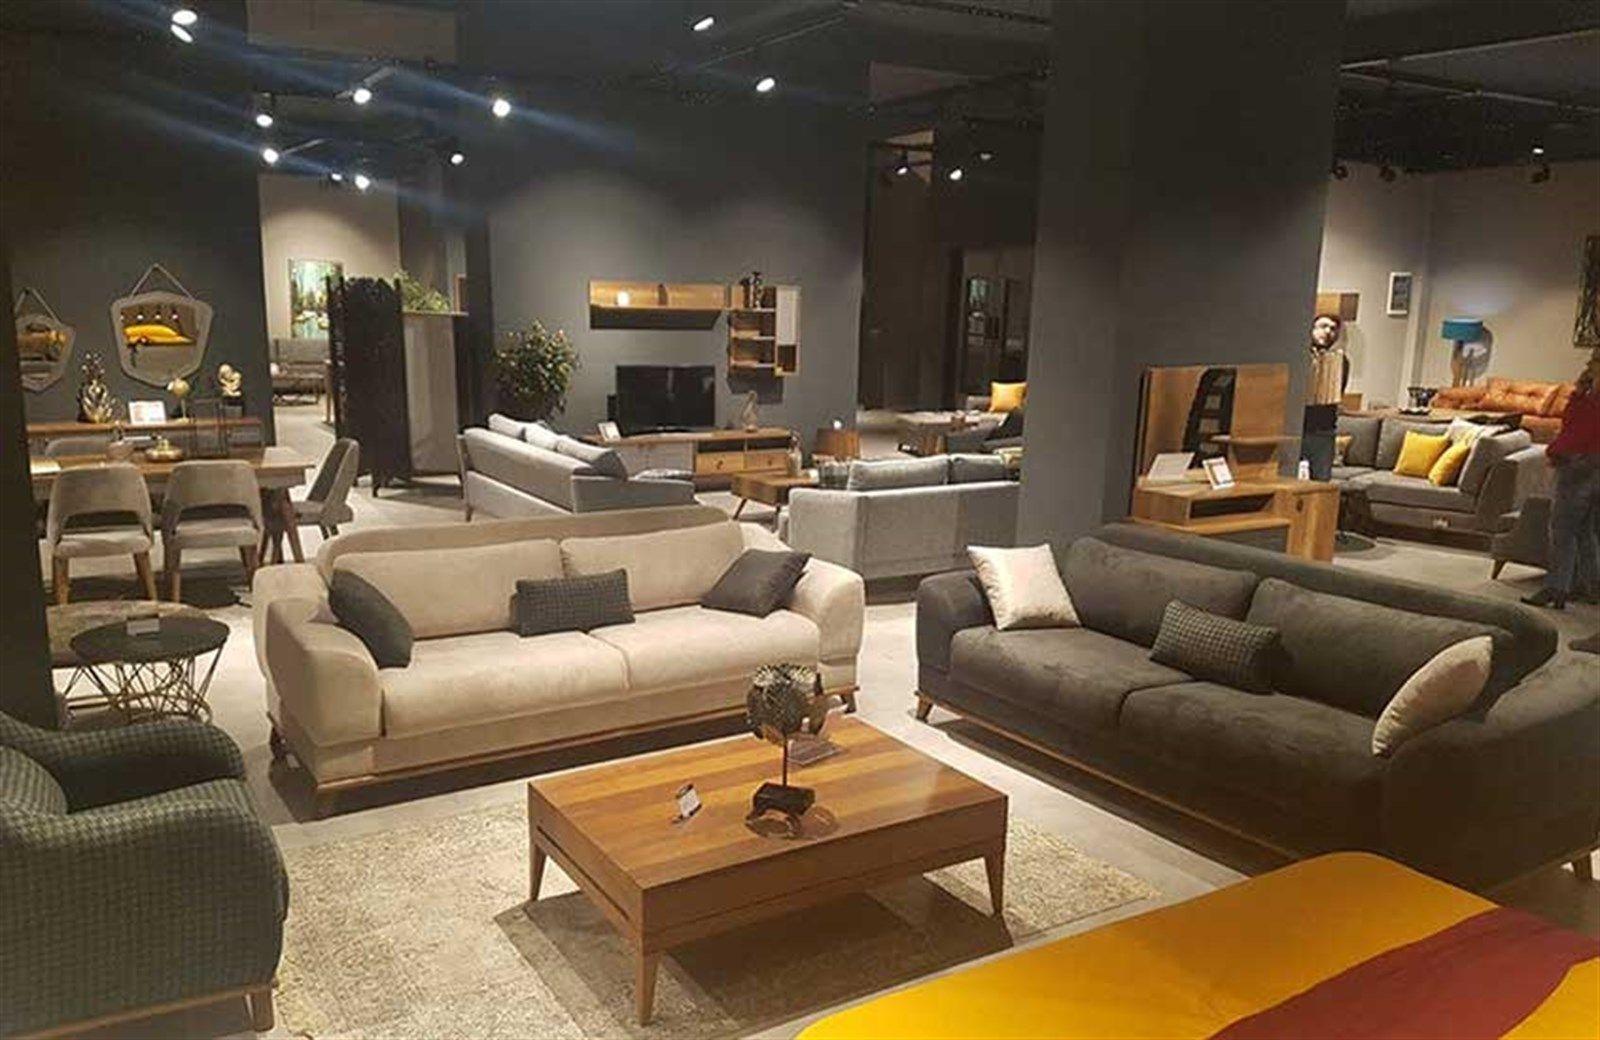 Evitra Delux Koltuk Takimi Engince Yatakodasitakimlari Koltuktakimlari Rapsodi Yemekodasitakimlari Home Decor Furniture Decor